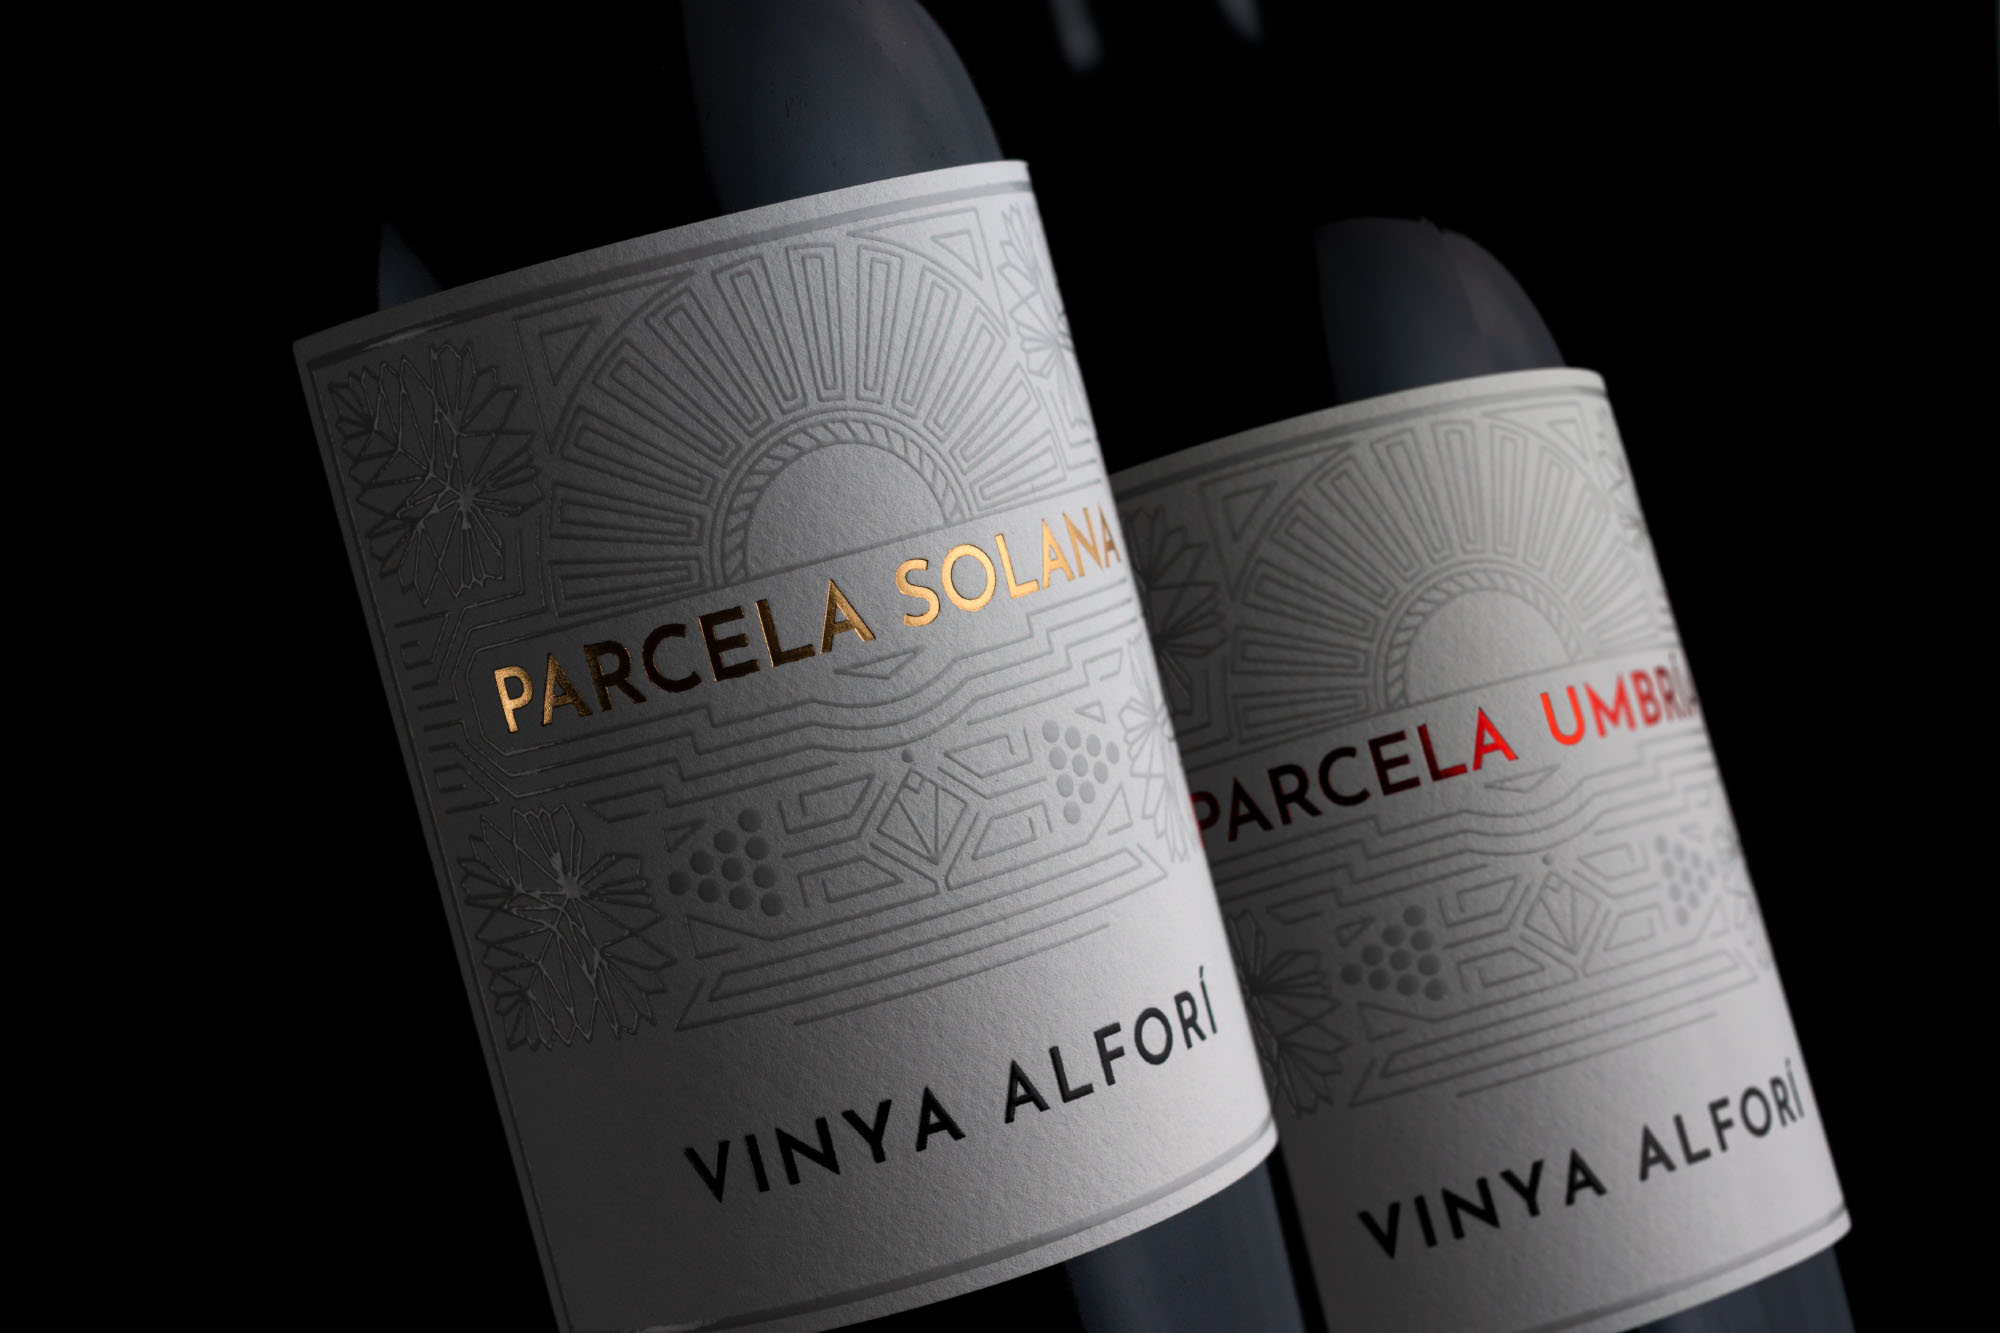 Parcela Vinya Alforí